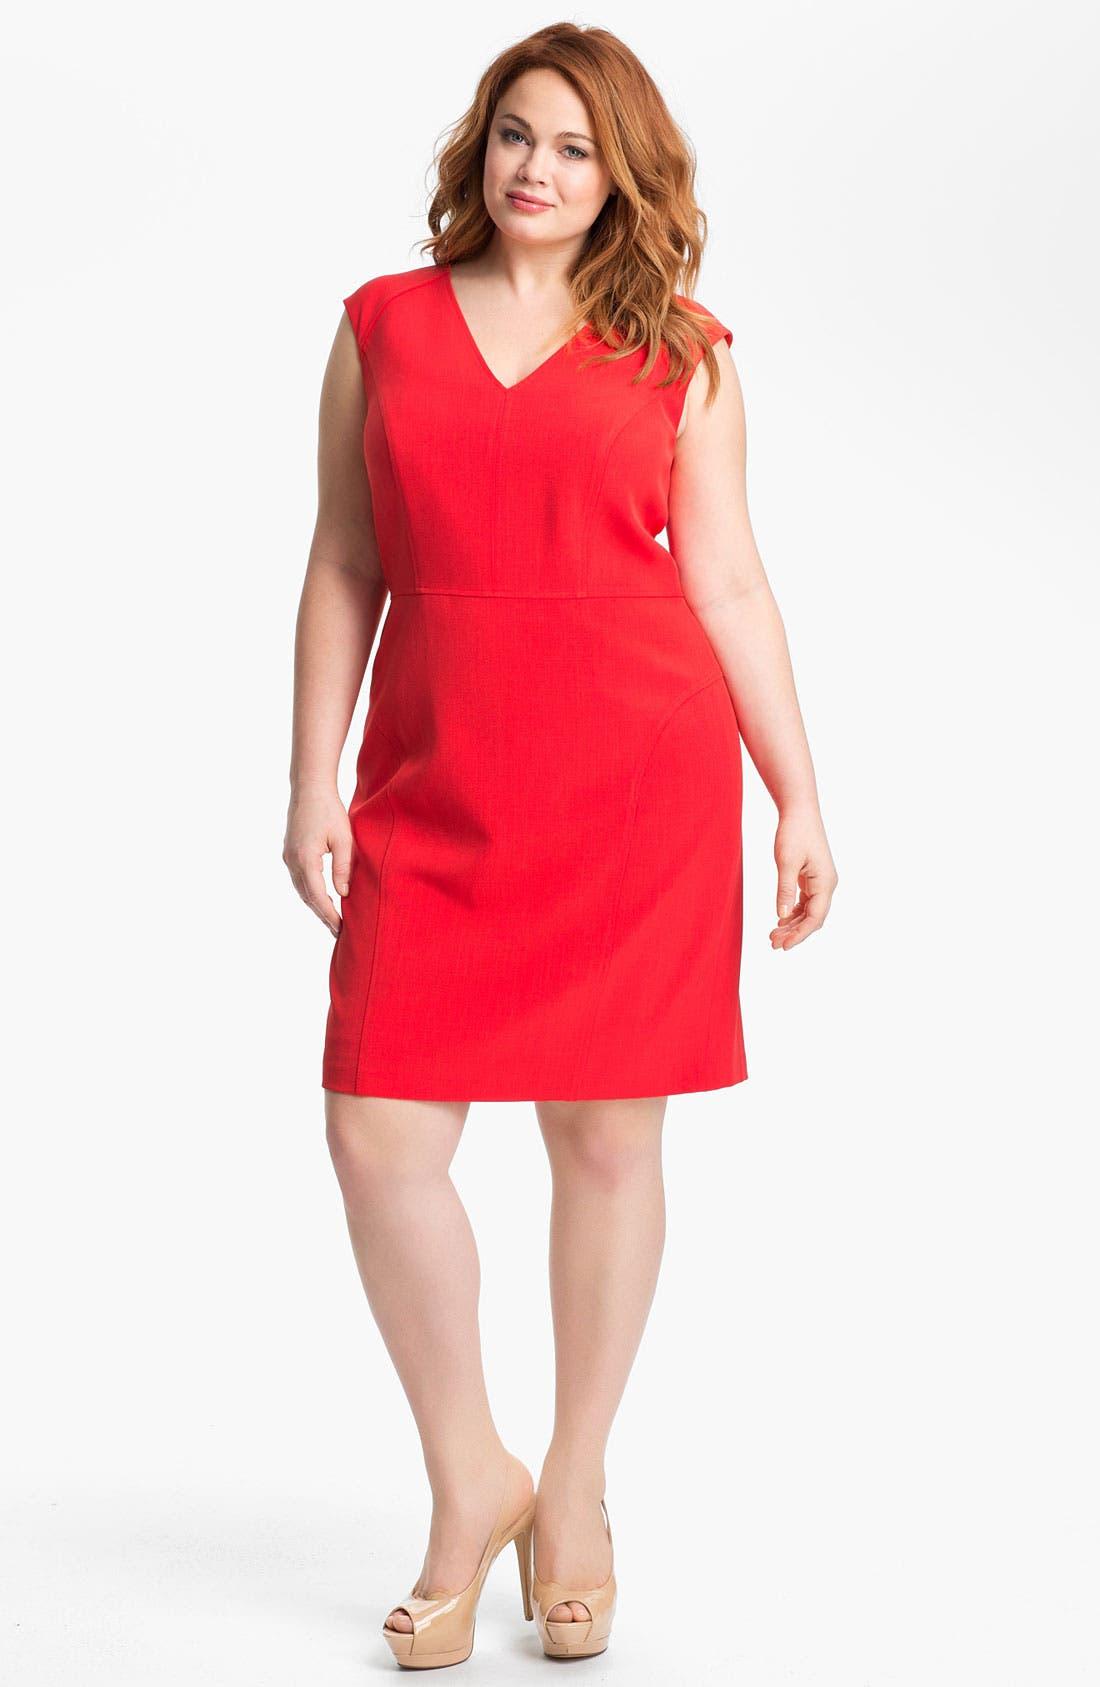 Alternate Image 1 Selected - Adrianna Papell Cap Sleeve Jersey Sheath Dress (Plus Size)